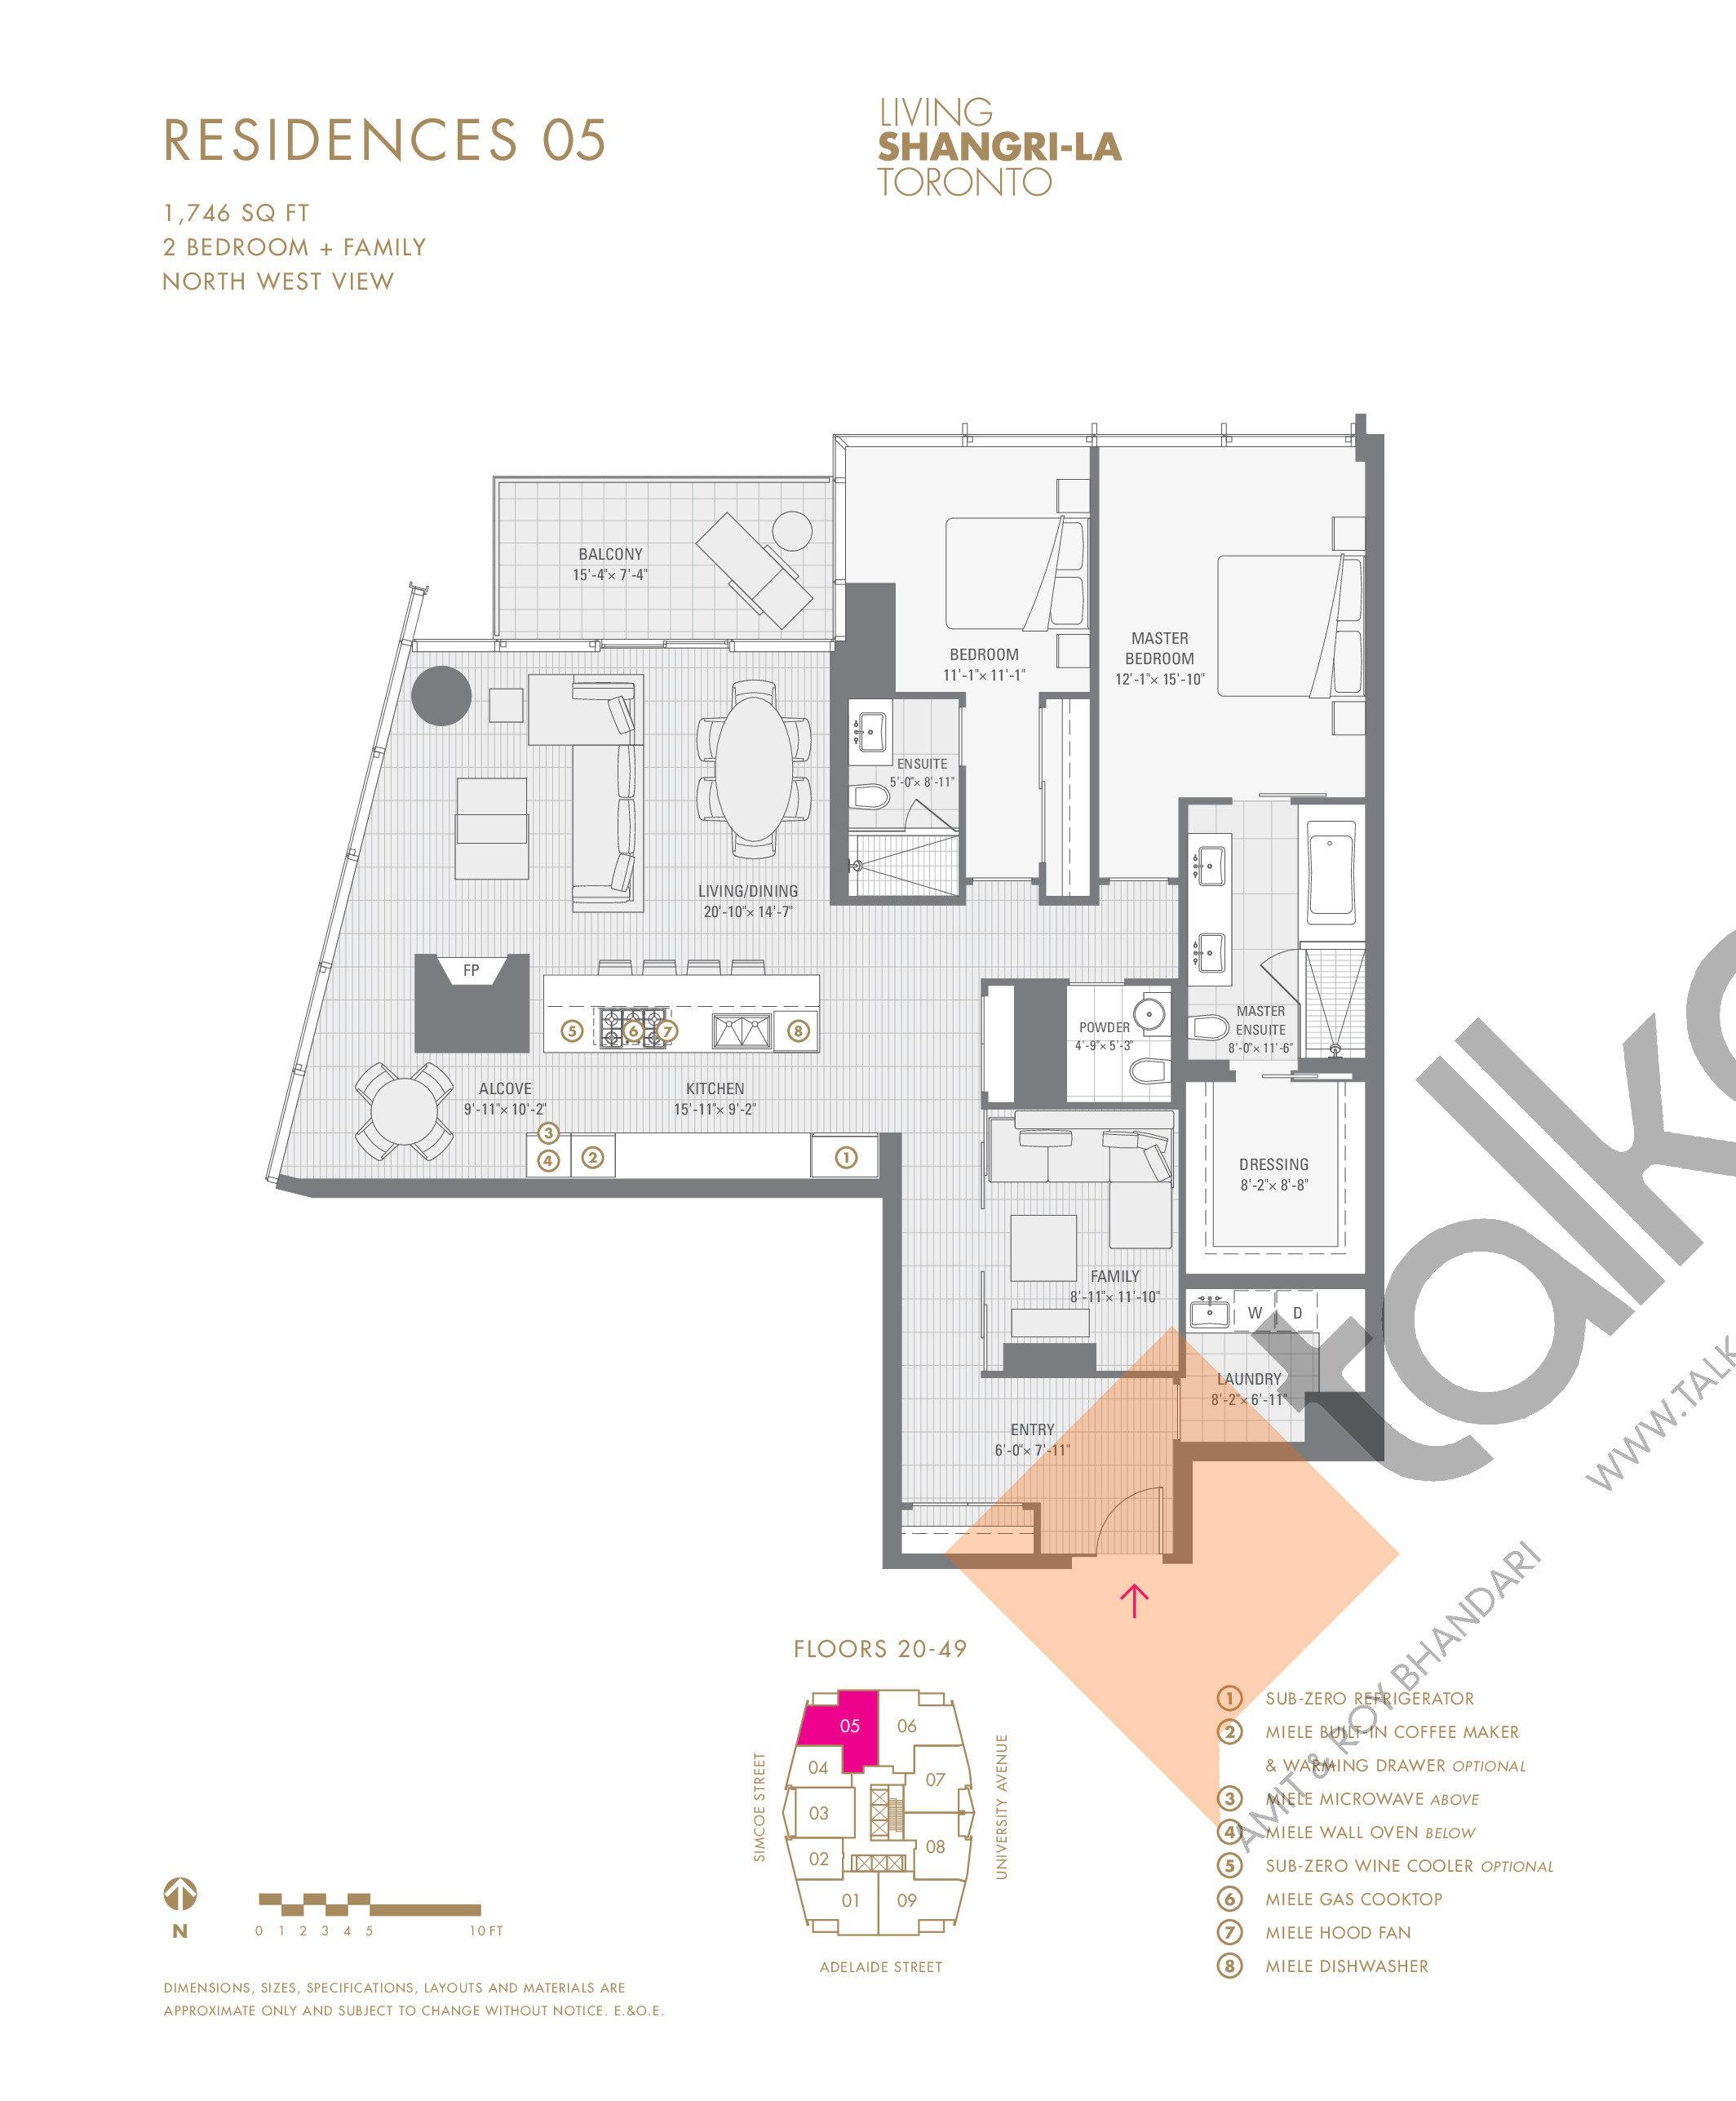 Shangri La Hotel Amp Residences Residences 03 1100 Sq Ft